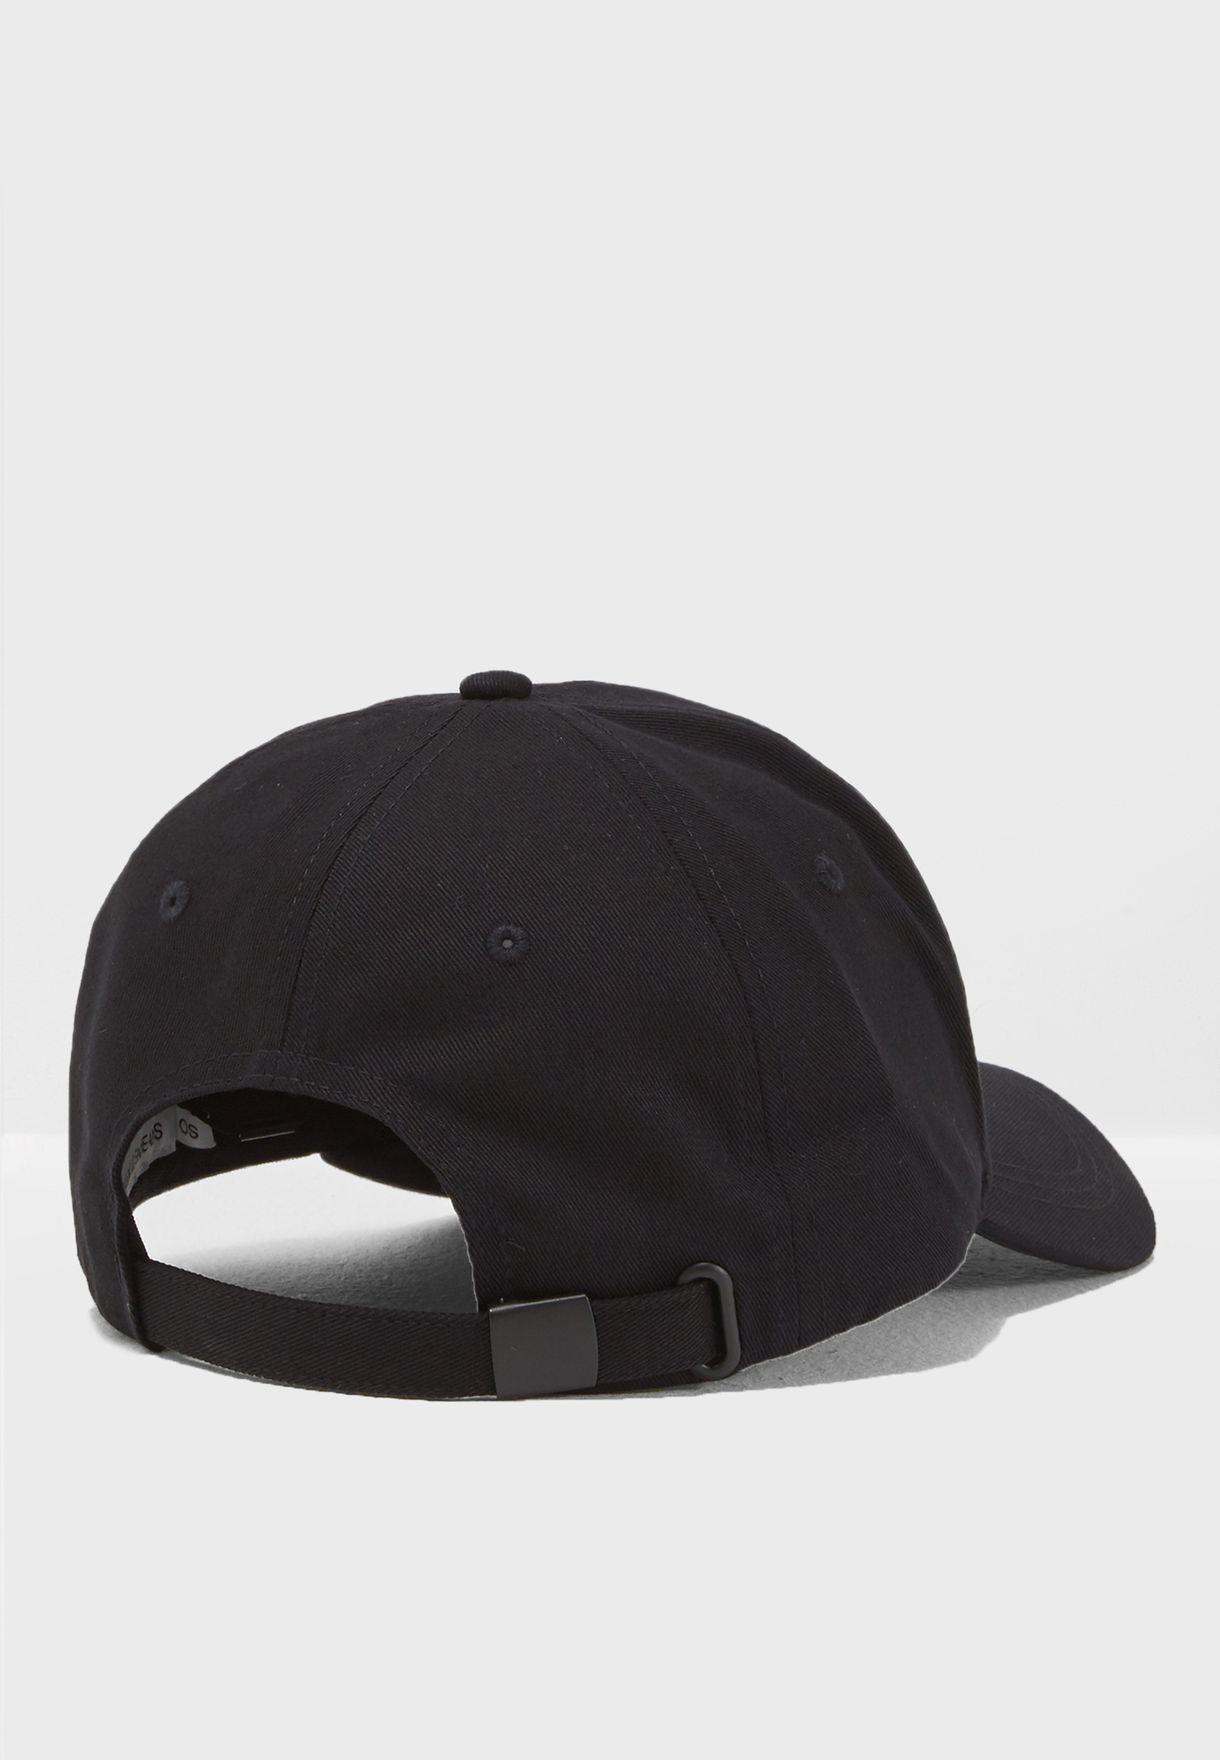 3111cbb7fbb Shop Calvin Klein Jeans black Reflective Curved Peak Cap ...